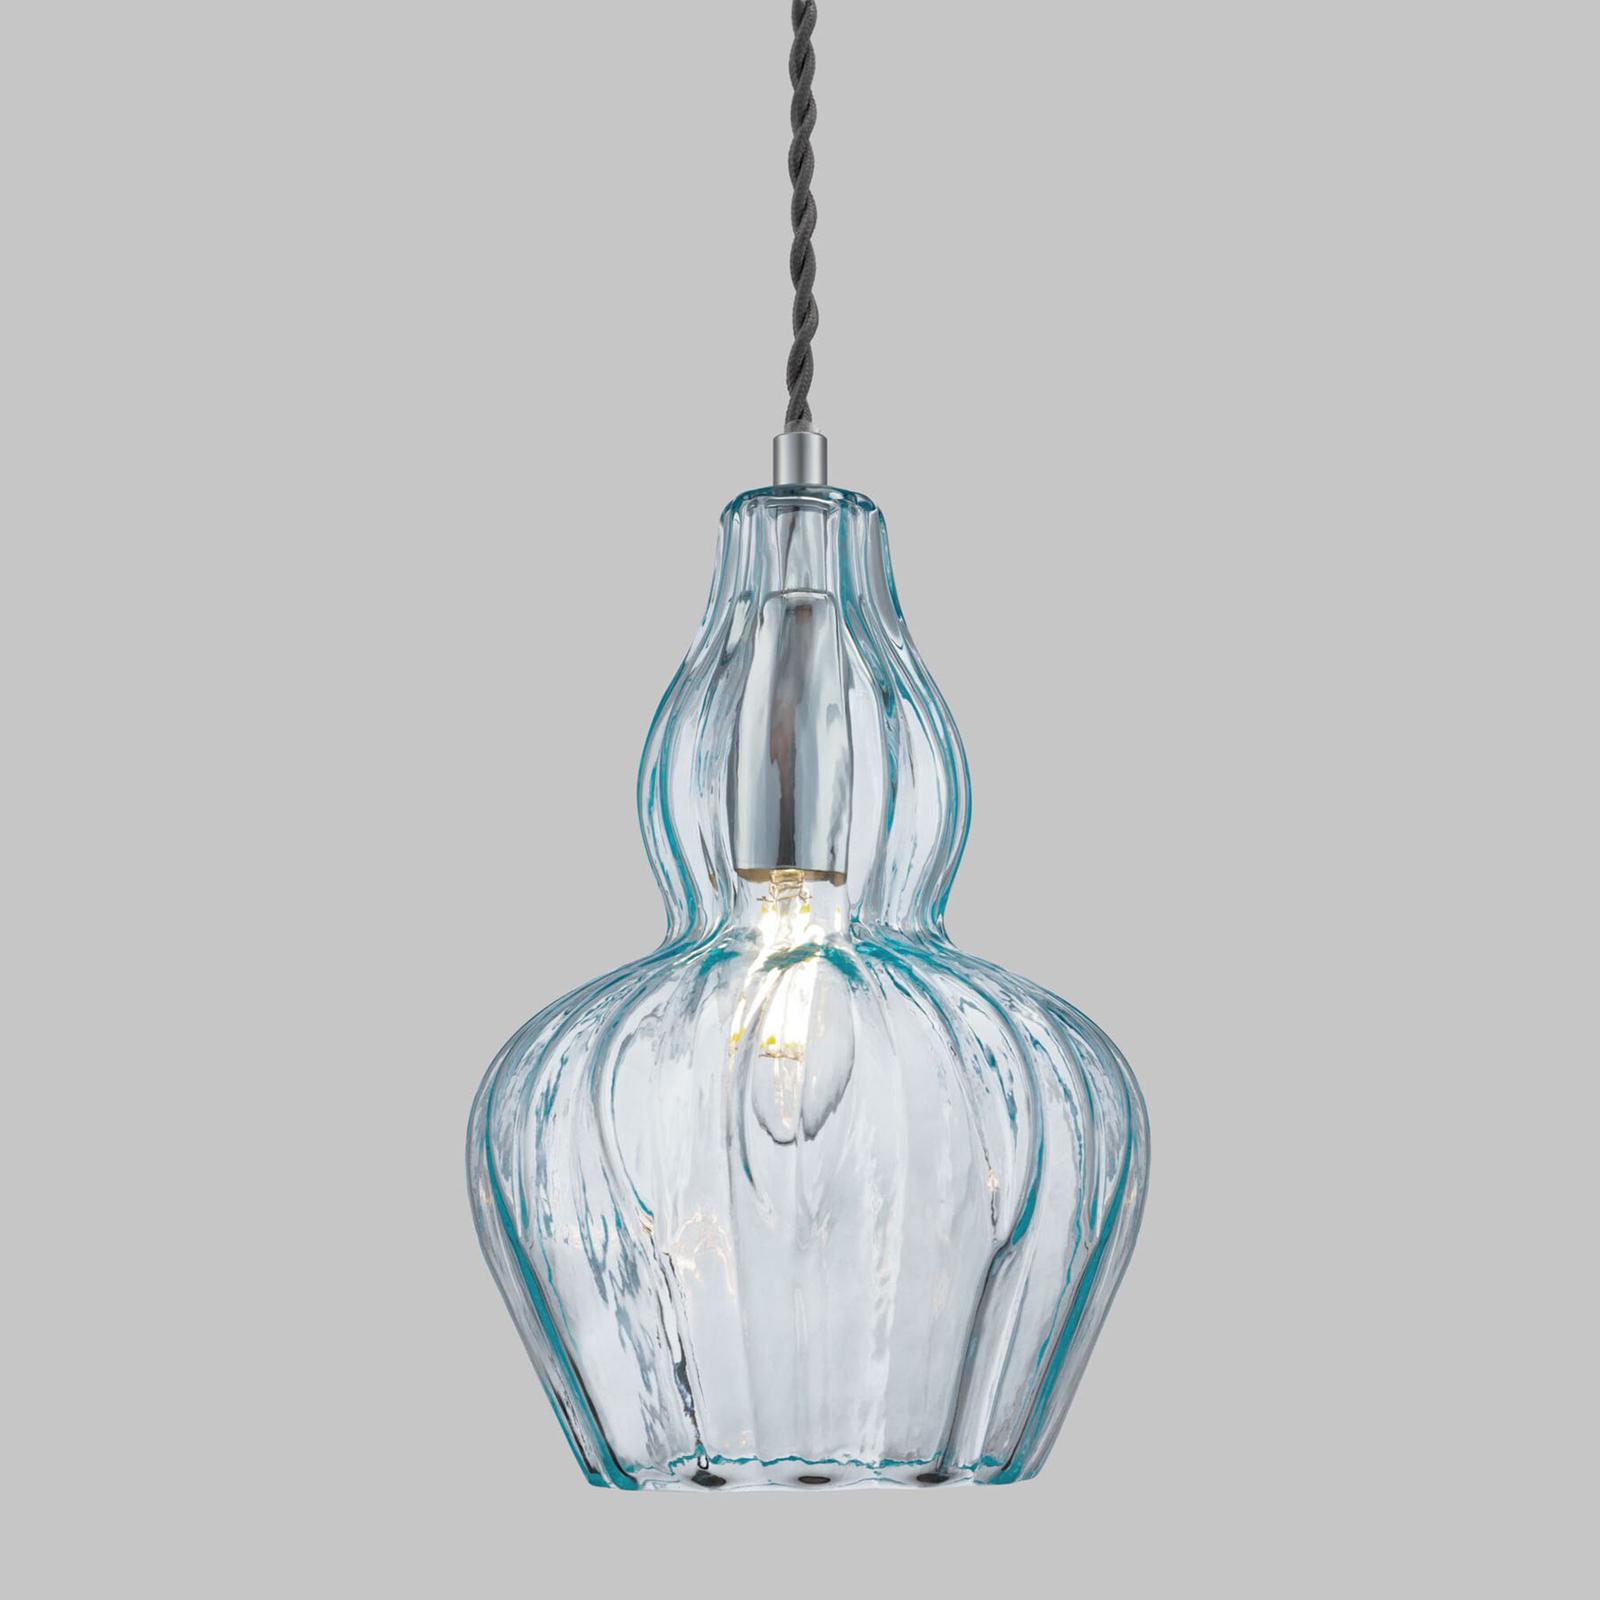 Hanglamp Eustoma lichtblauw